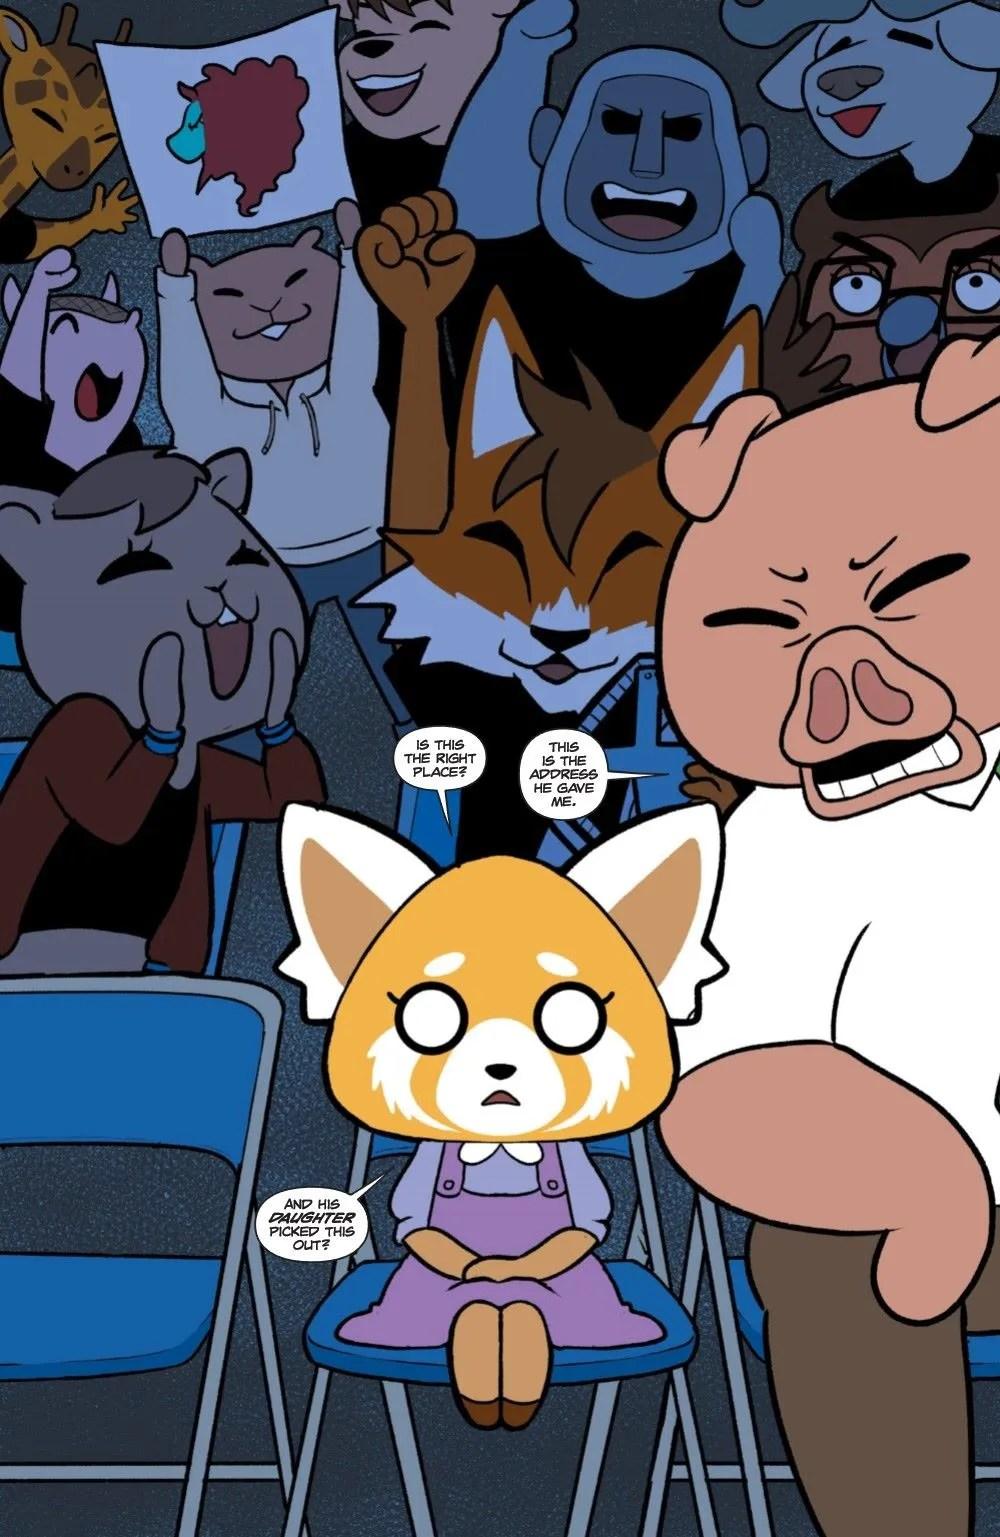 AGGRETSUKO-MHW-3-MARKETING-10 ComicList Previews: AGGRETSUKO MEET HER WORLD #3